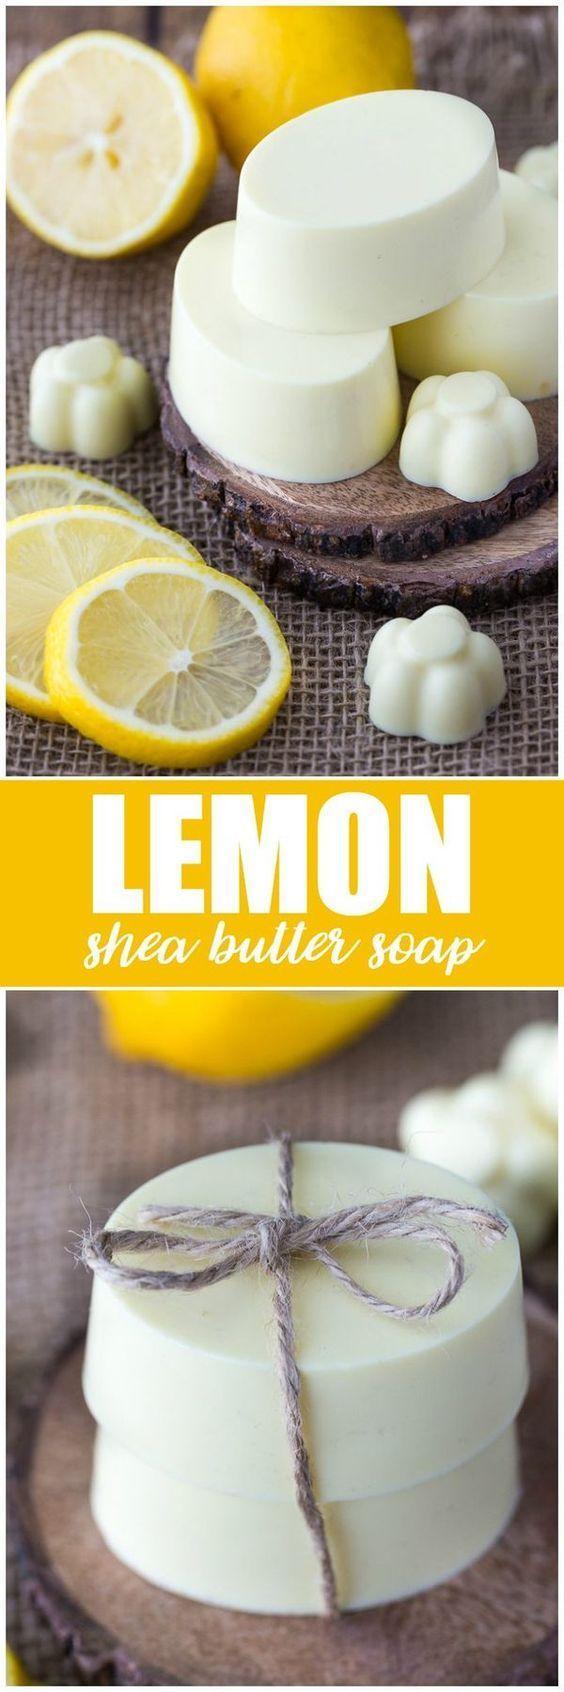 Lemon shea butter soap diy  Mydło